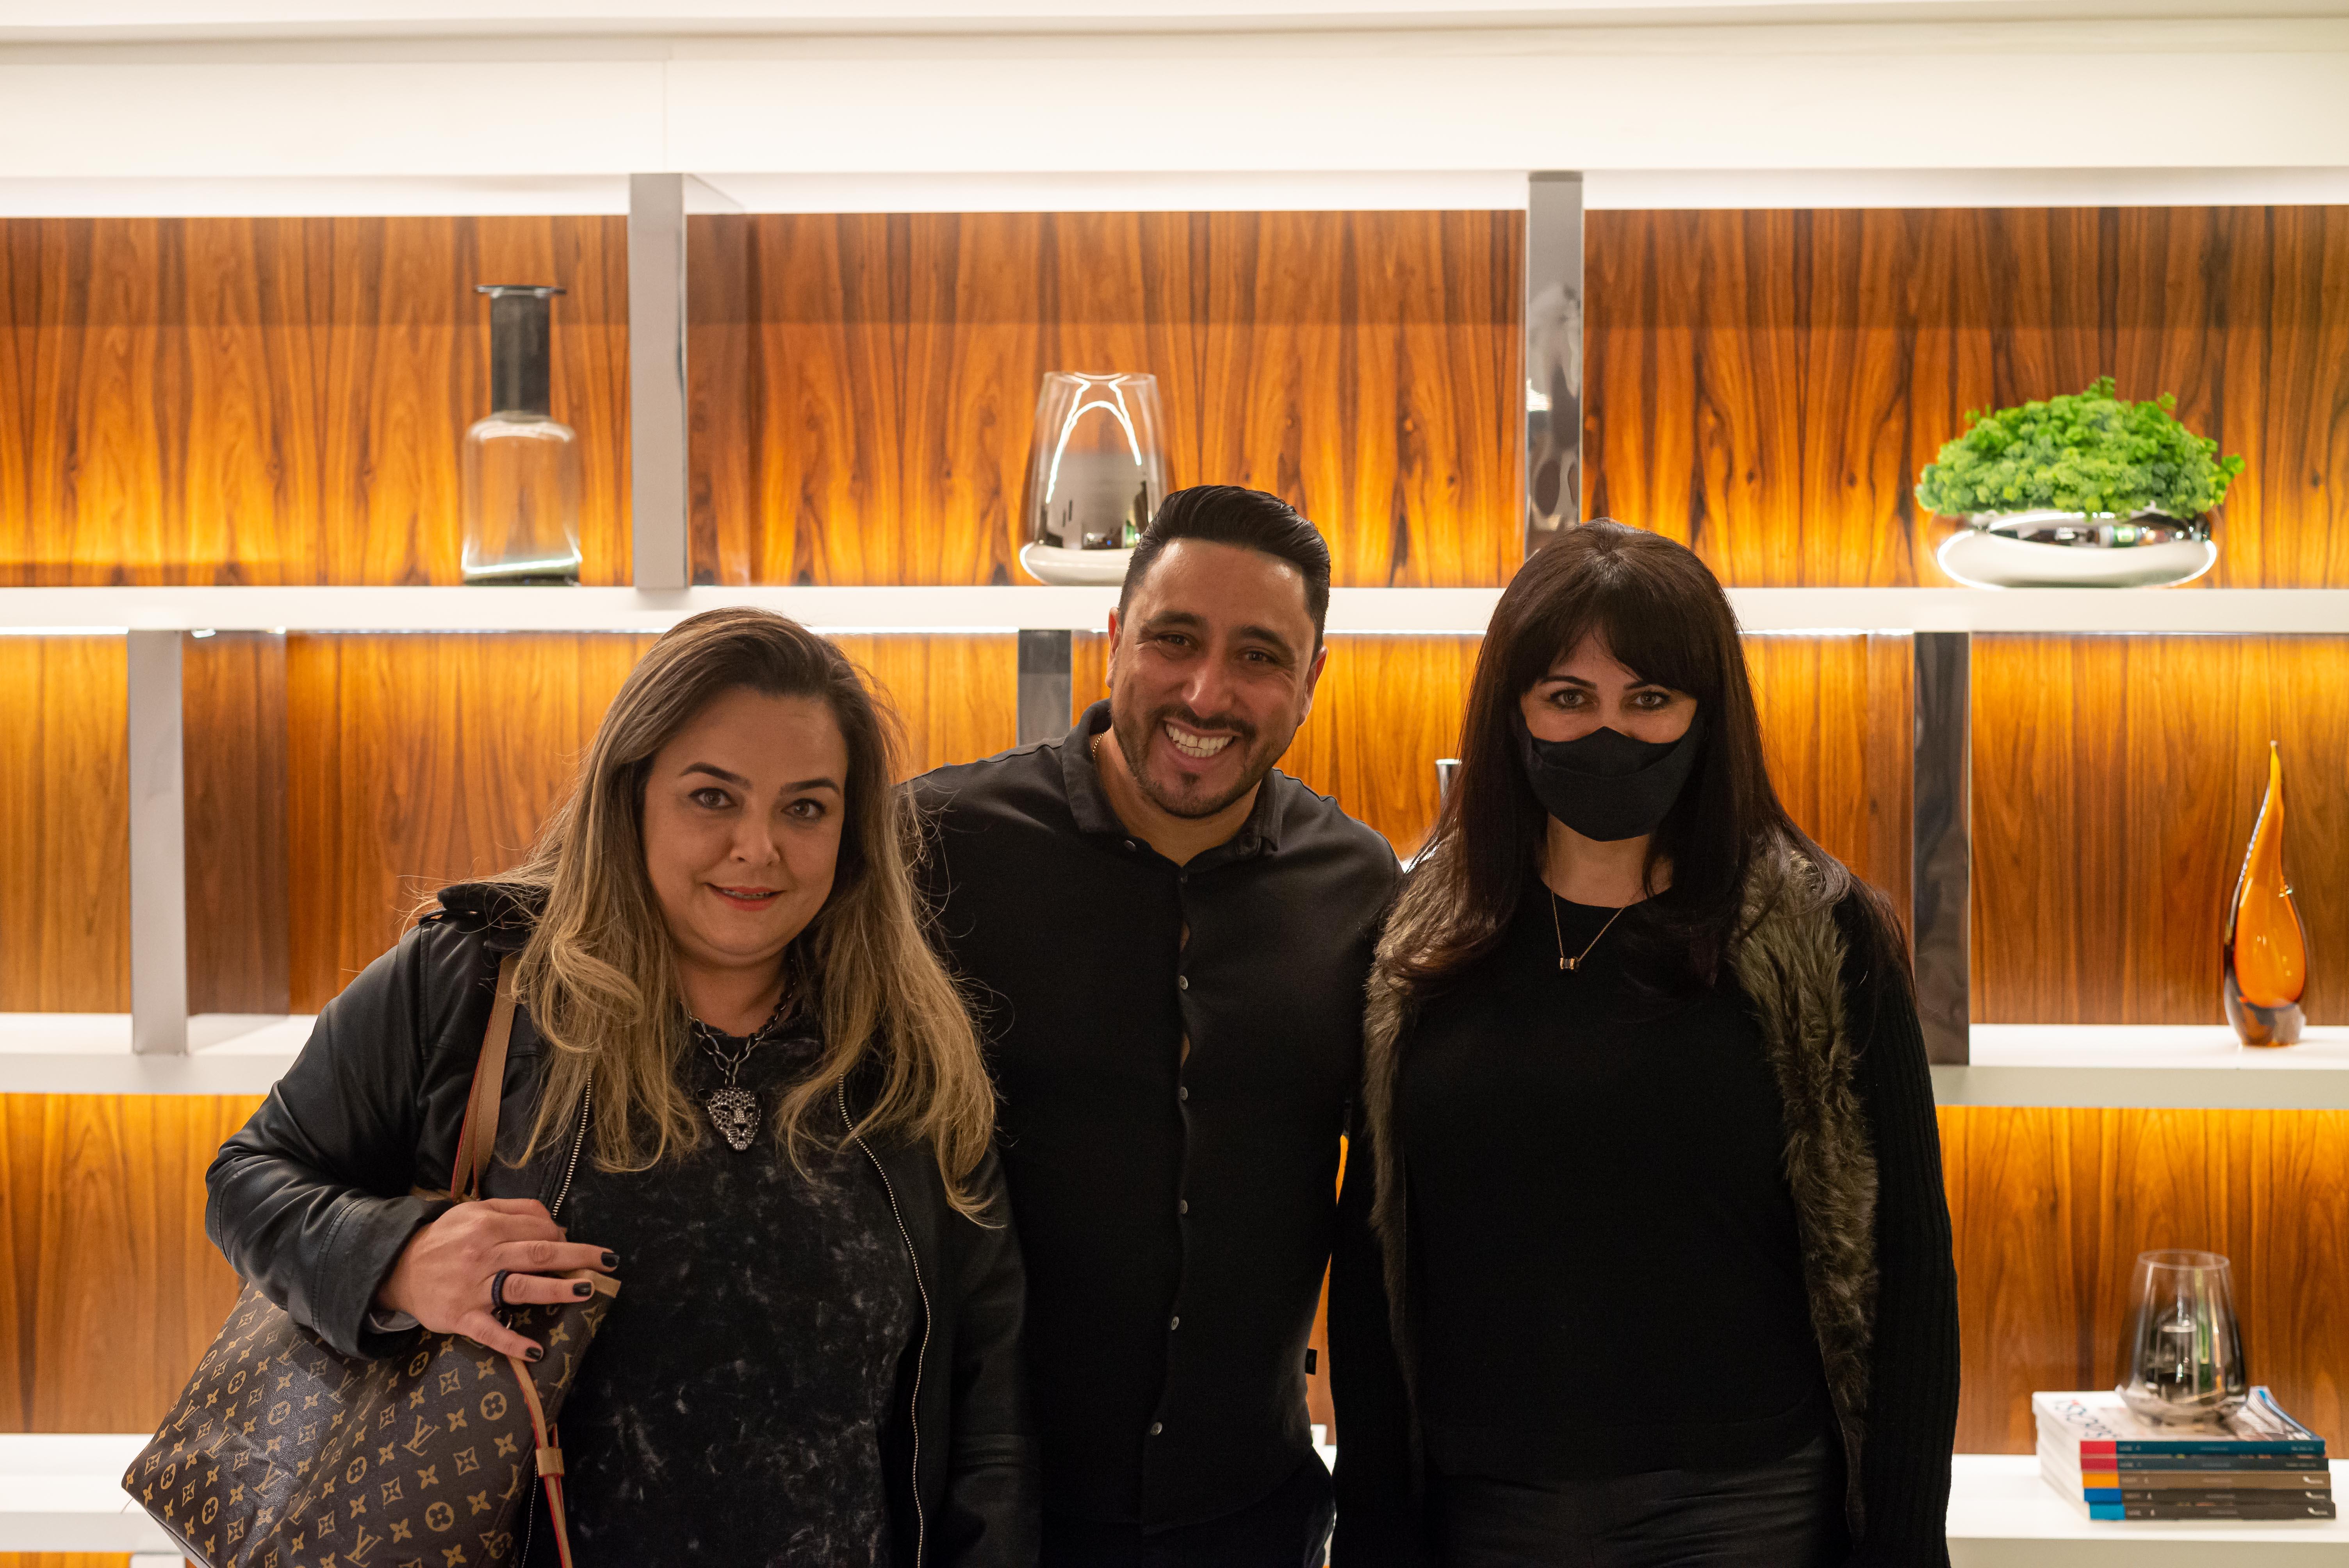 Vanessa Neves, o sócio da Mobitec, Eleandro Miranda, e Maria Alice Berndt.